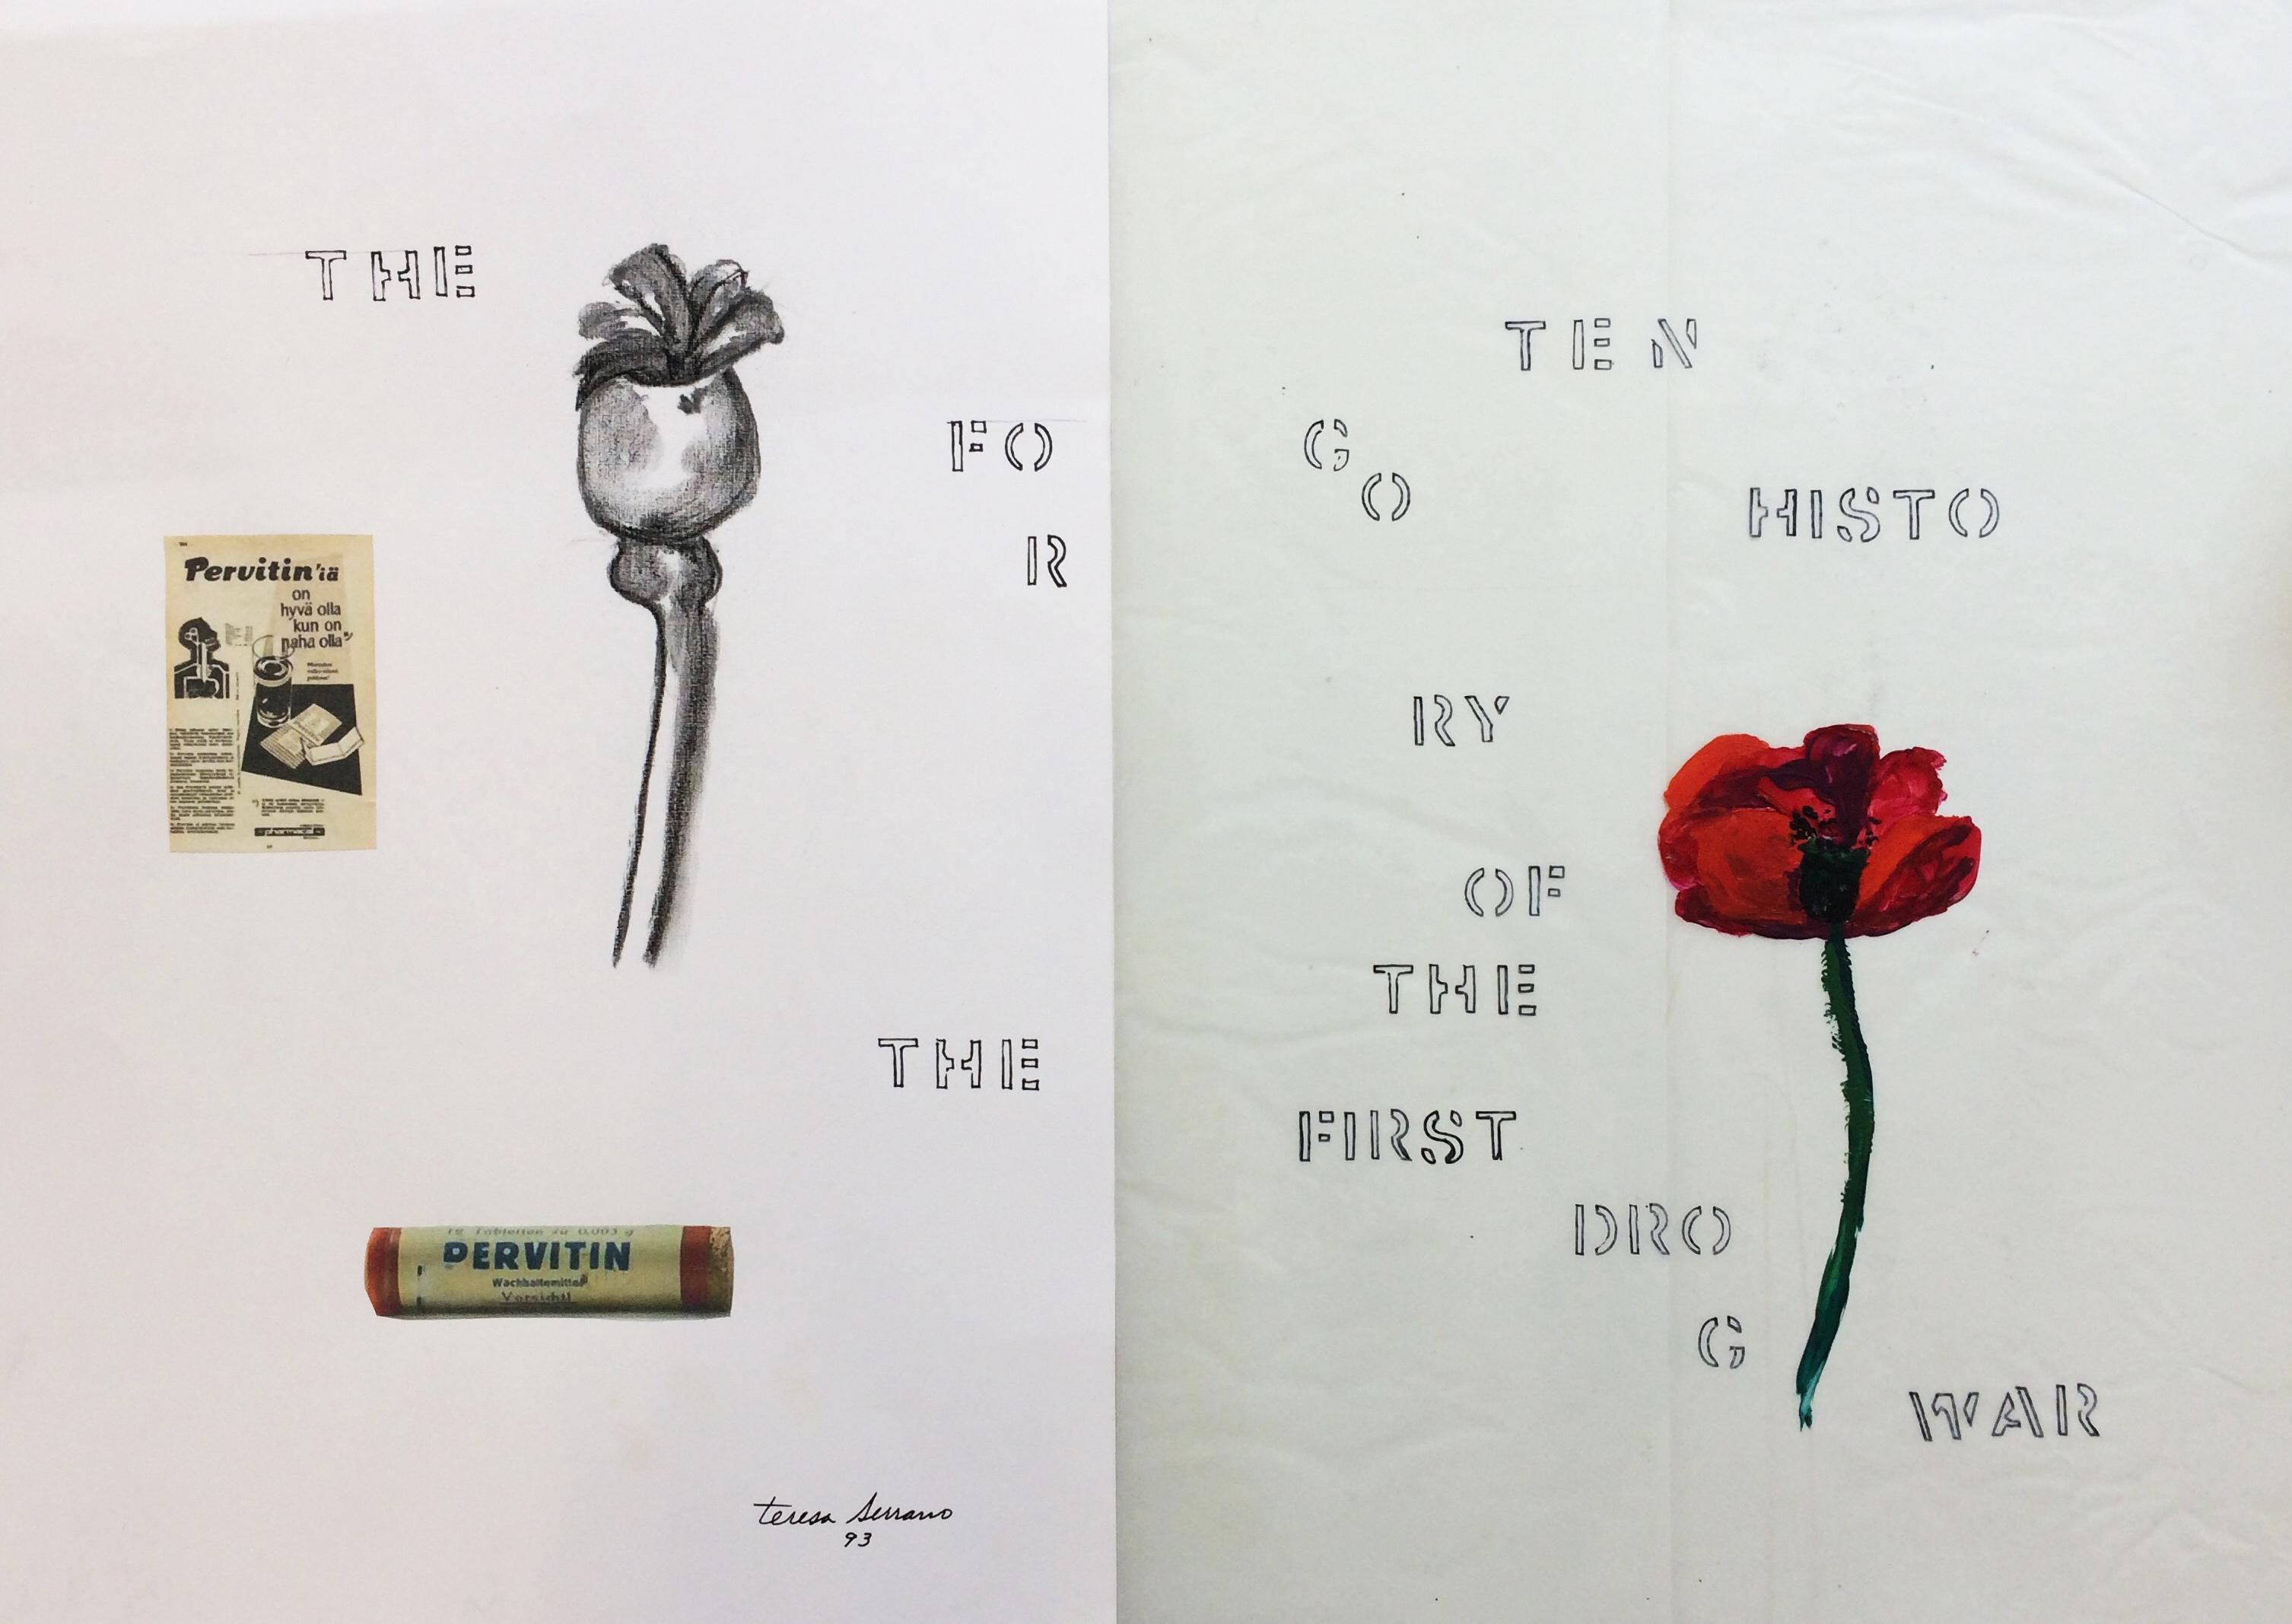 The raging war against drugs essay